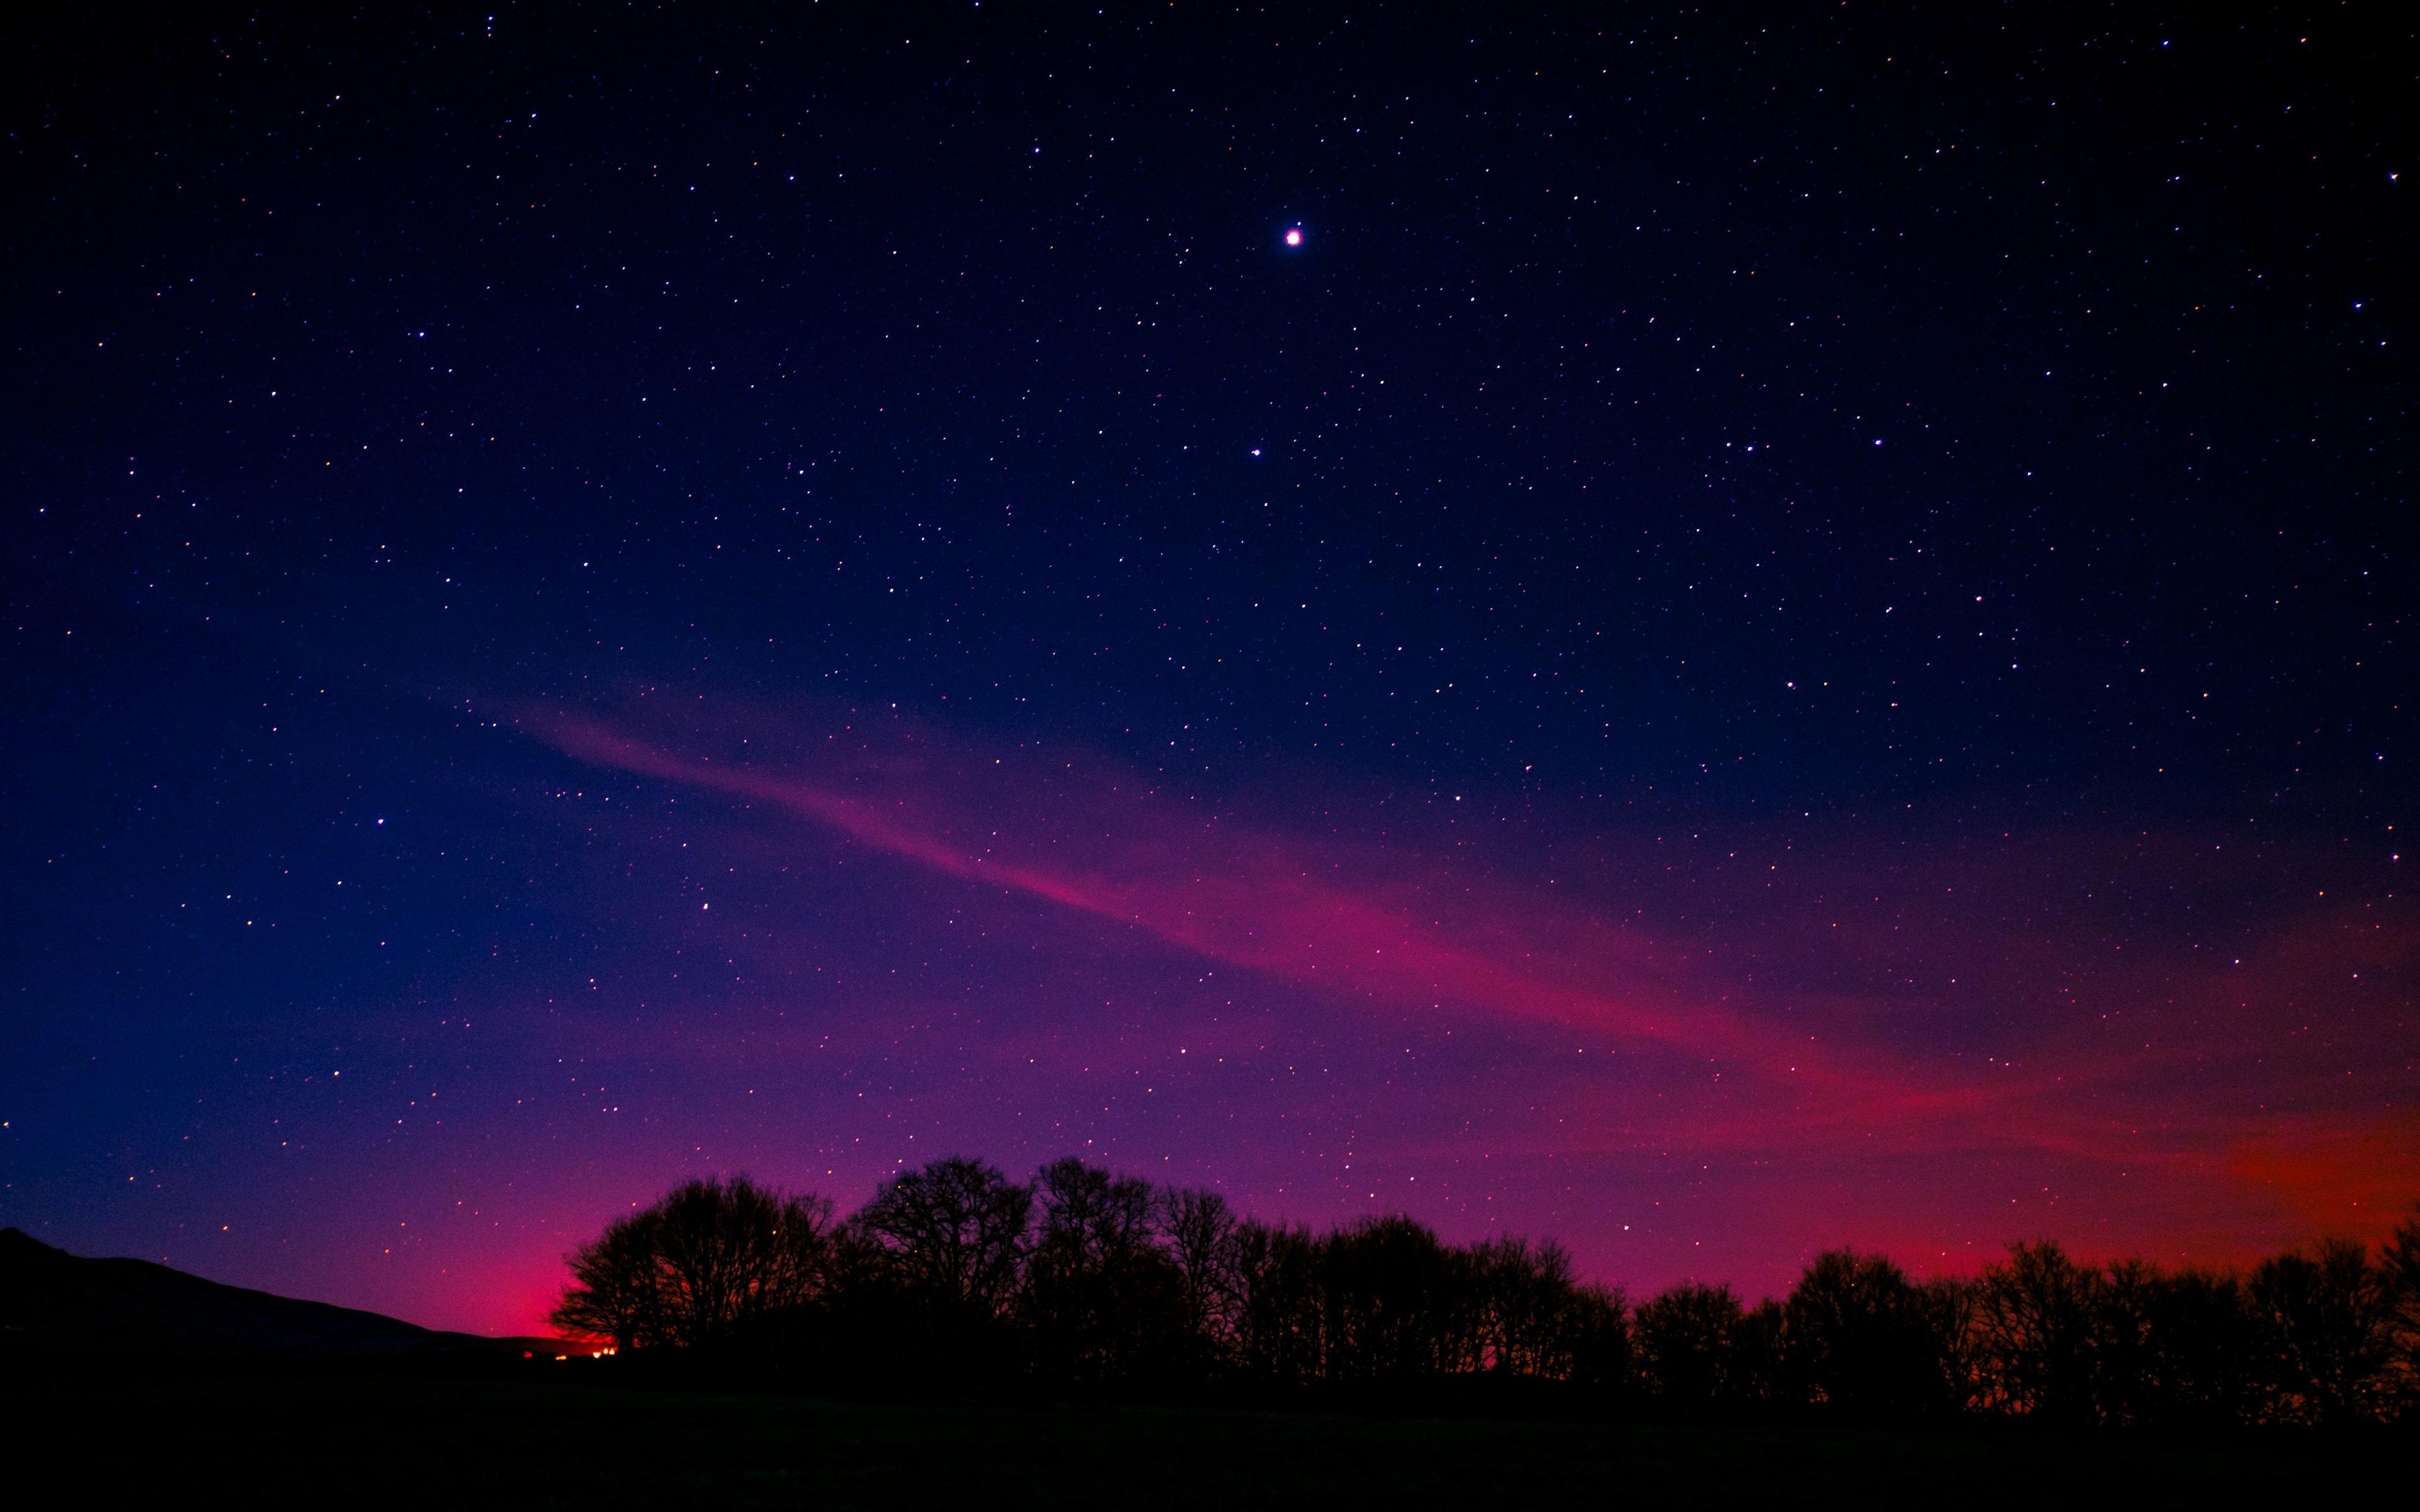 Download 3840x2400 wallpaper blue pink sky starry night for Night sky wallpaper 4k